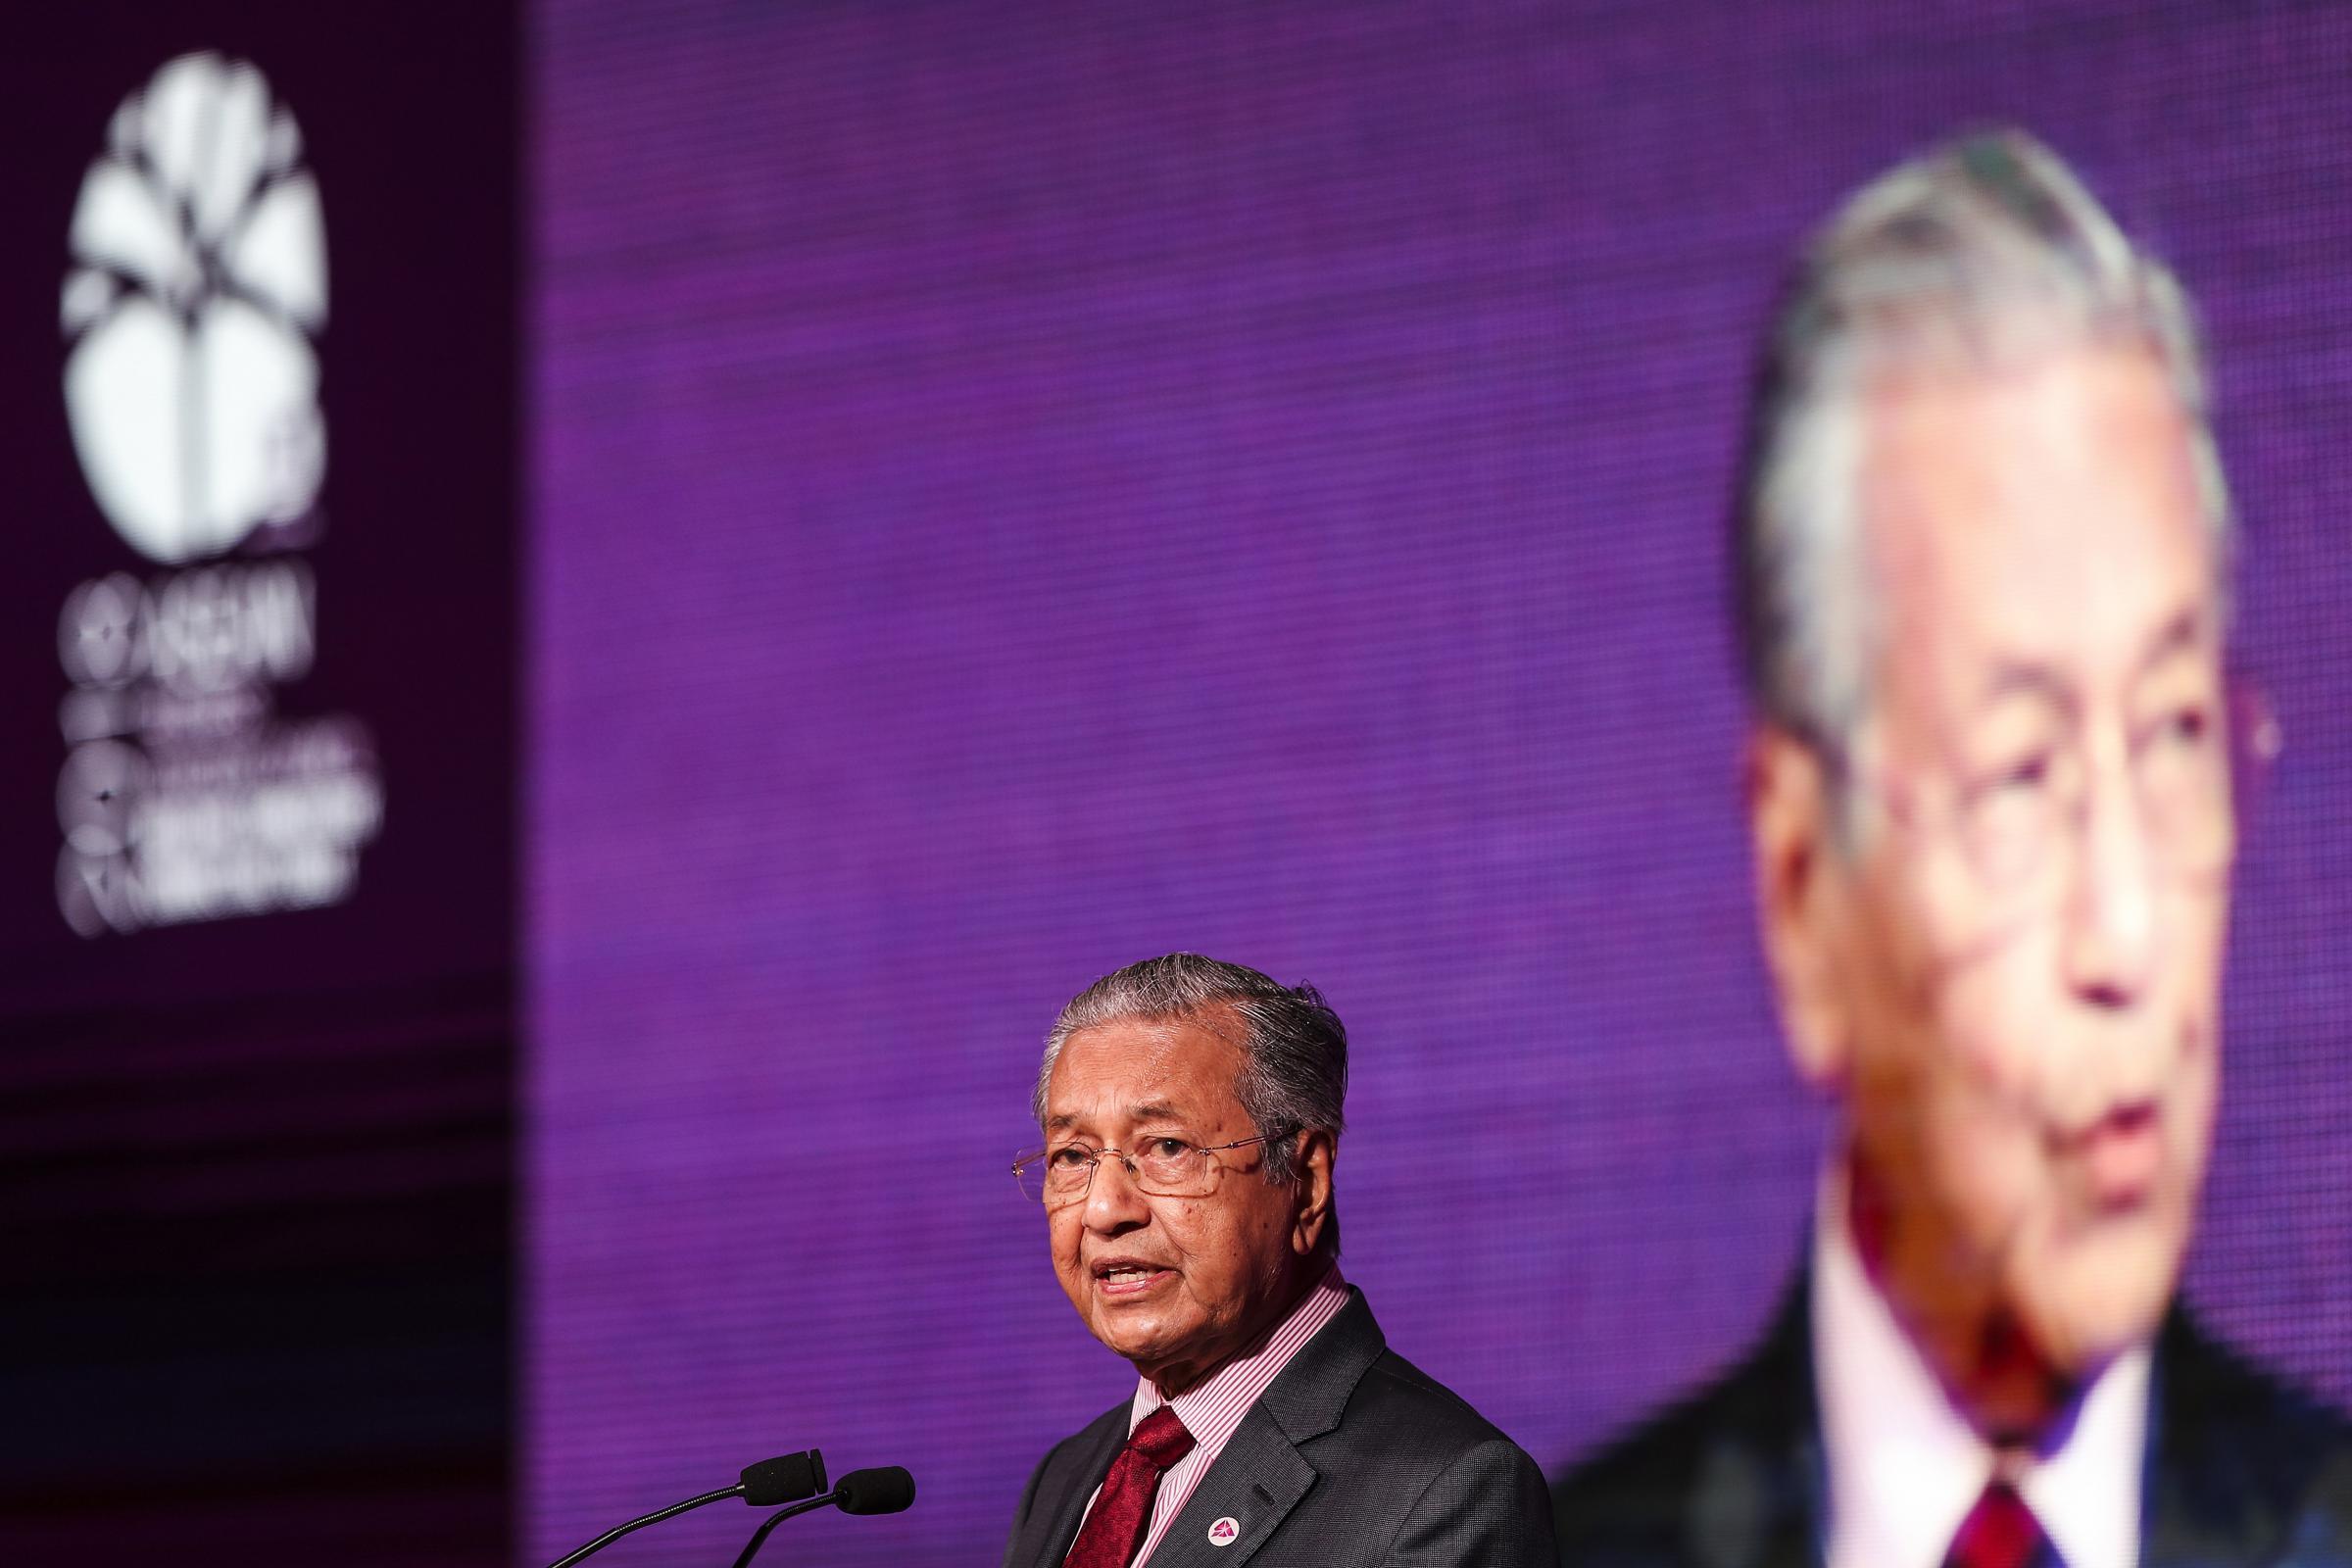 Malaysian PM slams Suu Kyi for handling of Rohingya crisis in Burma